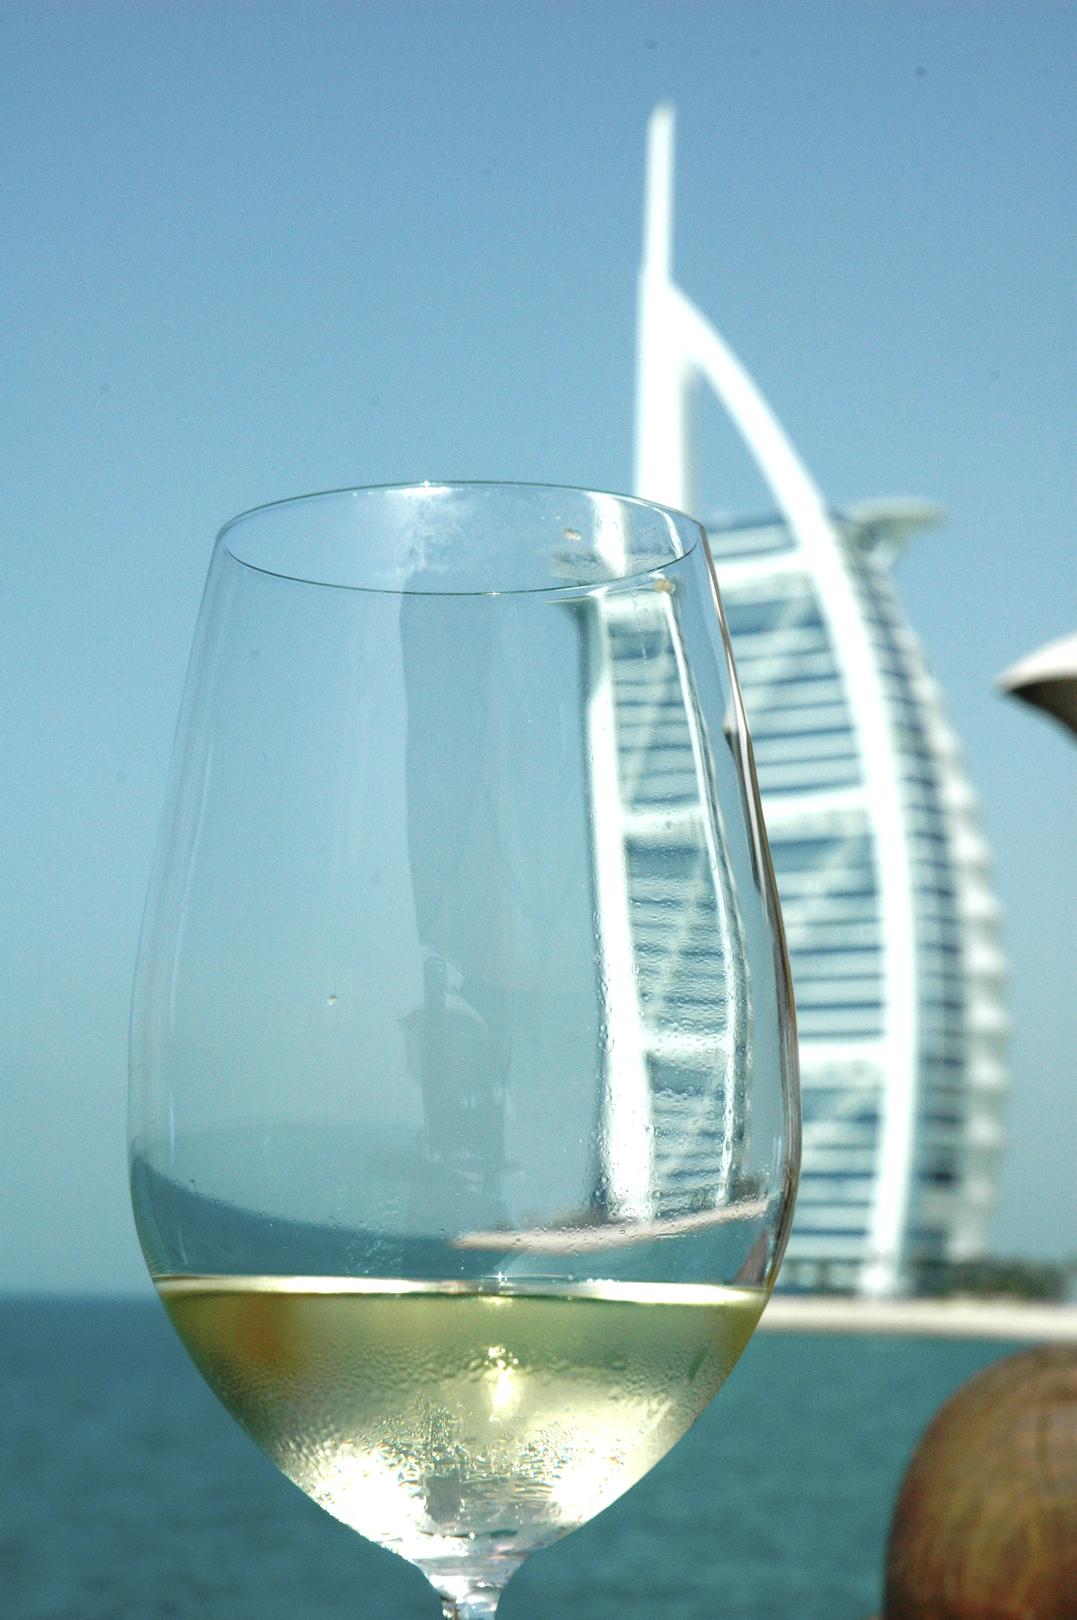 11 morsomme ting å gjøre i Dubai